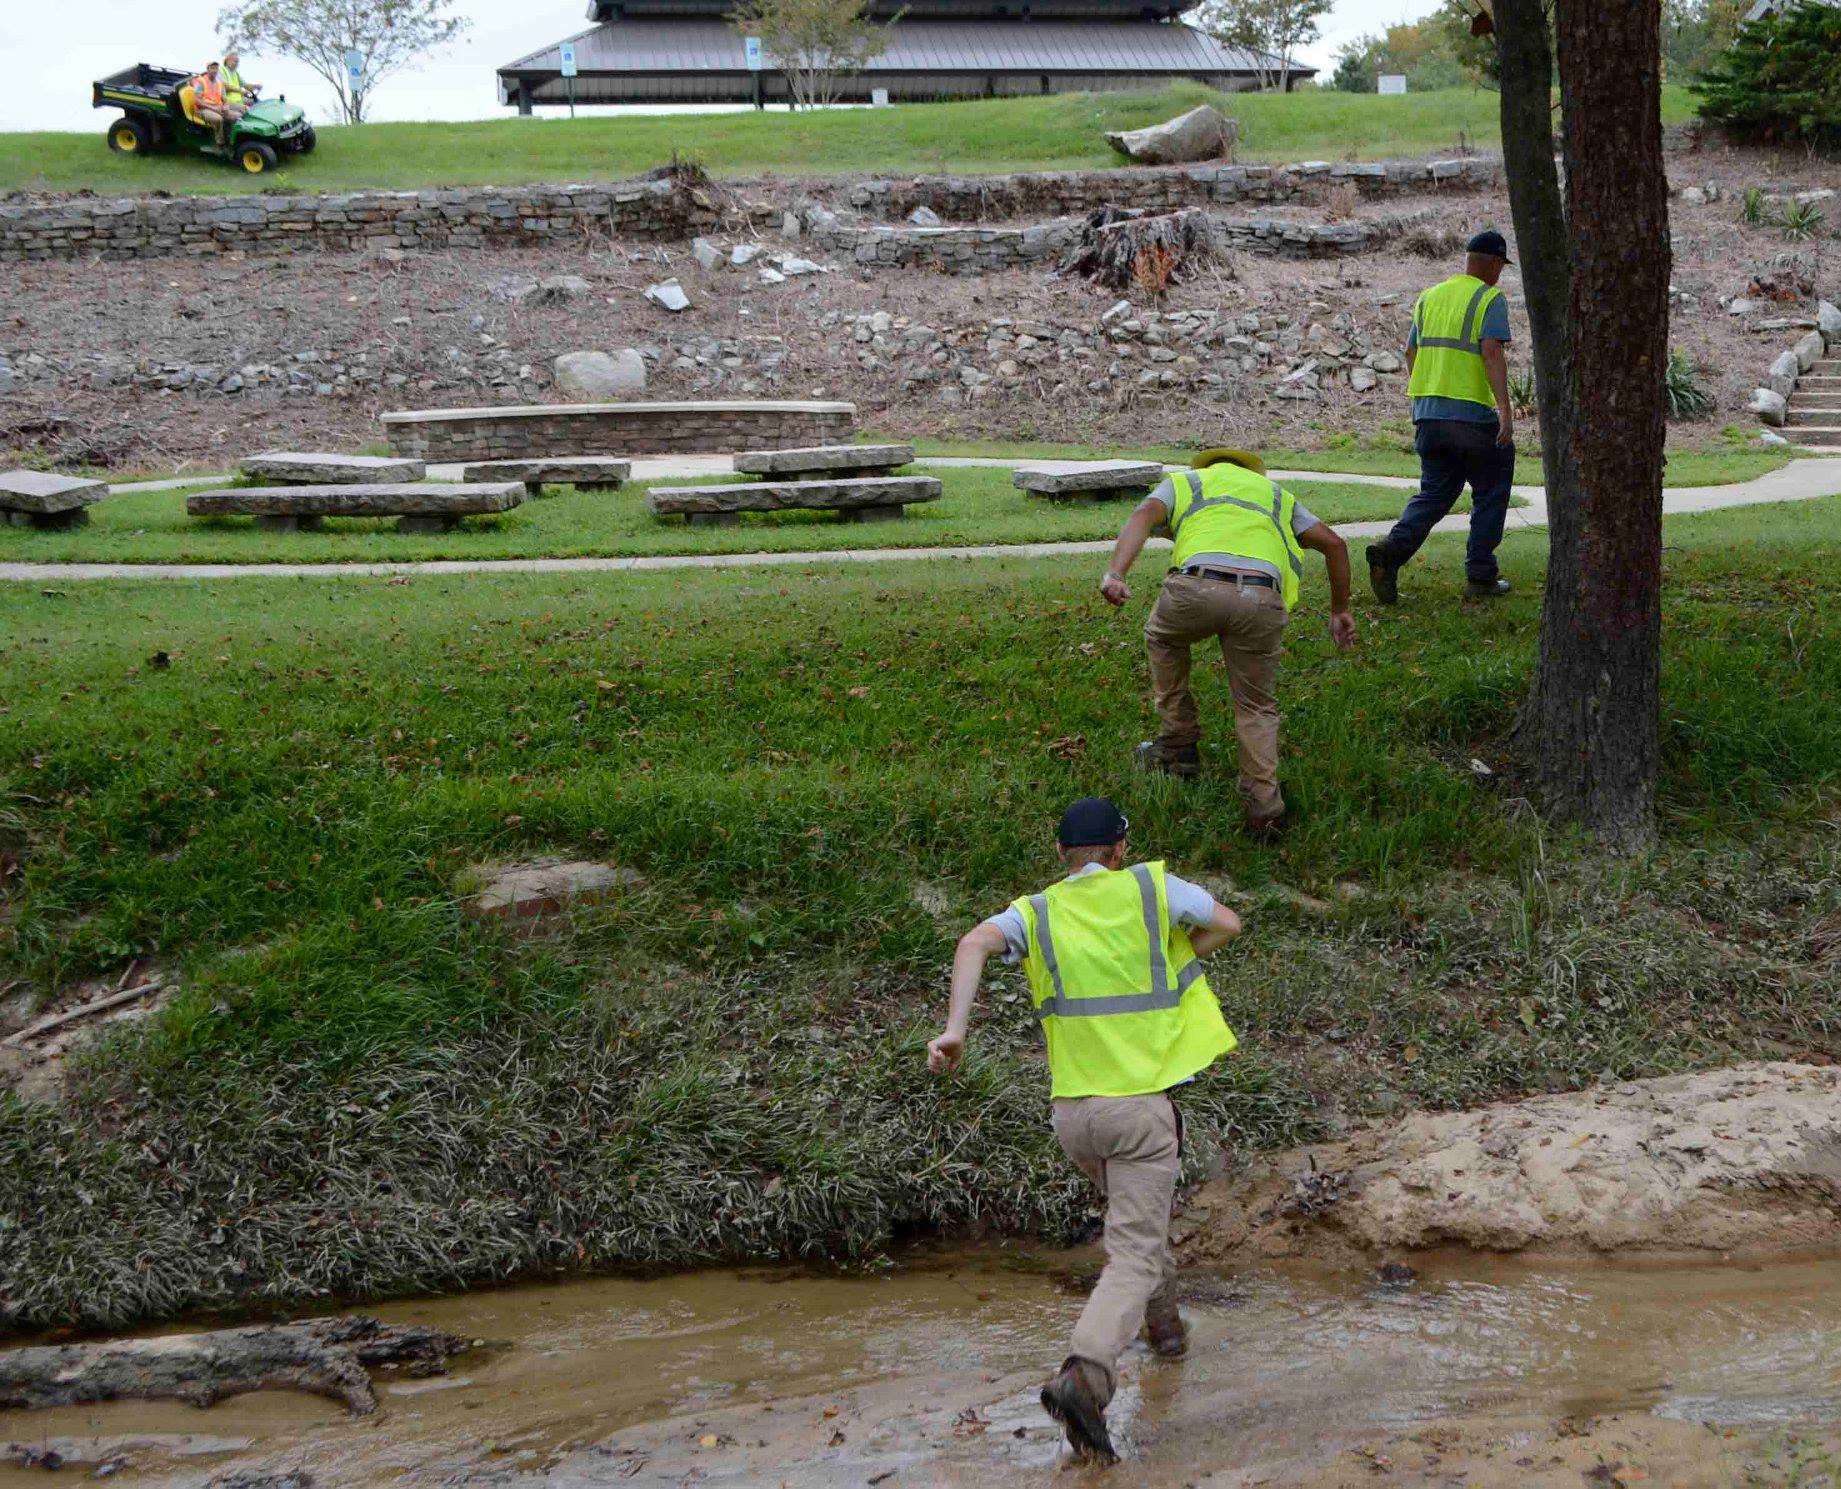 Police: Missing boy was at North Carolina park before death